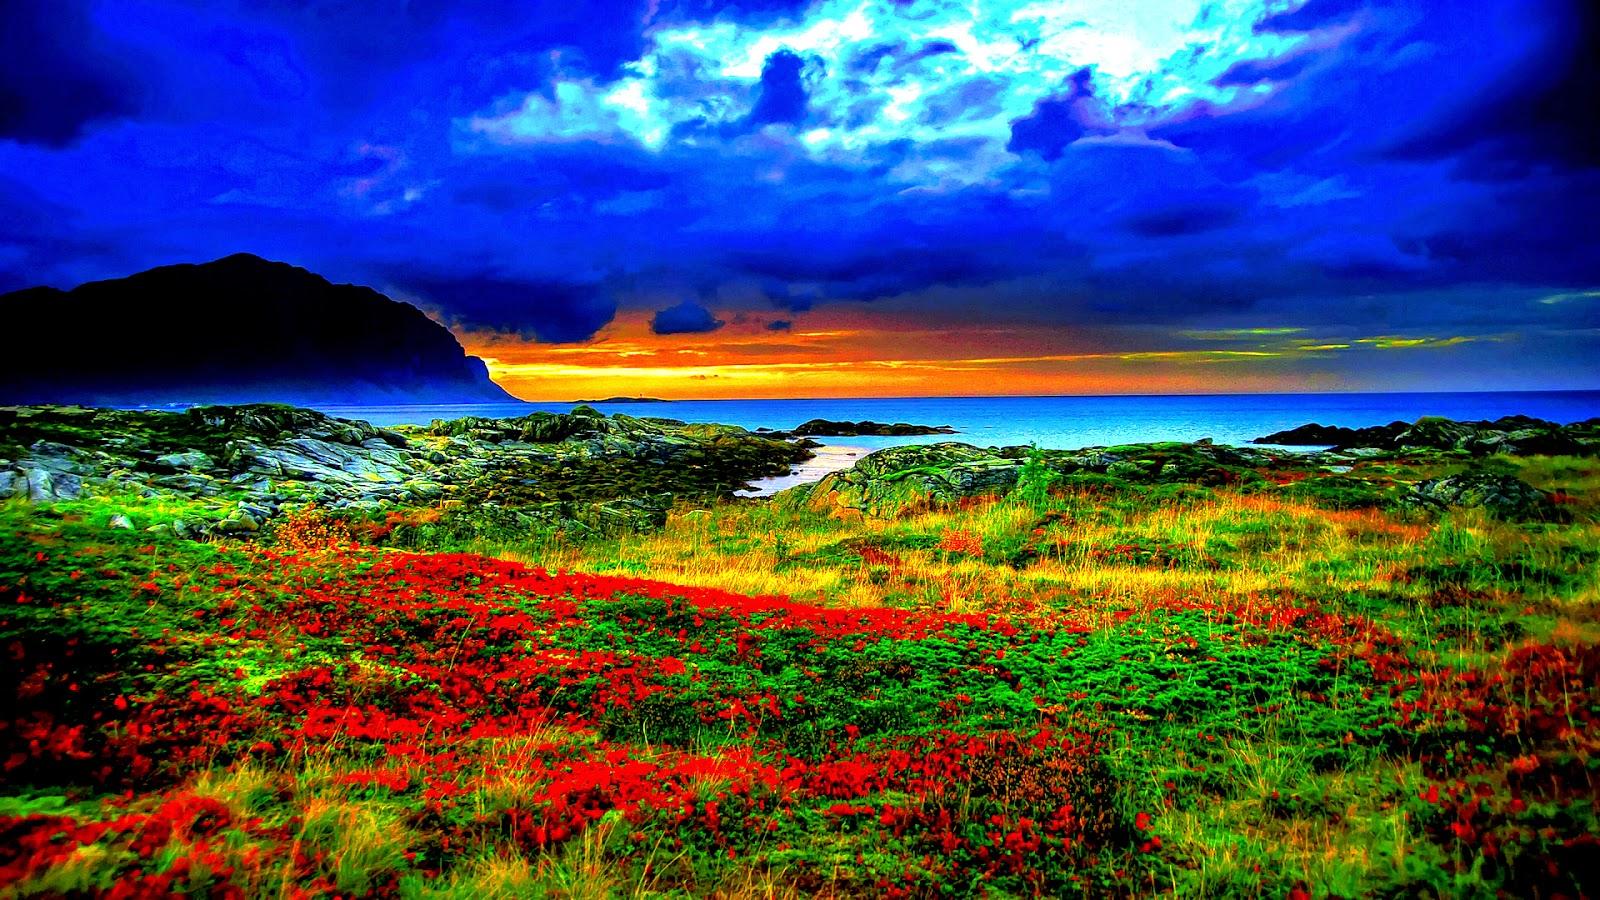 25 Best Spring Landscape HD Wallpapers - Bookmarks100